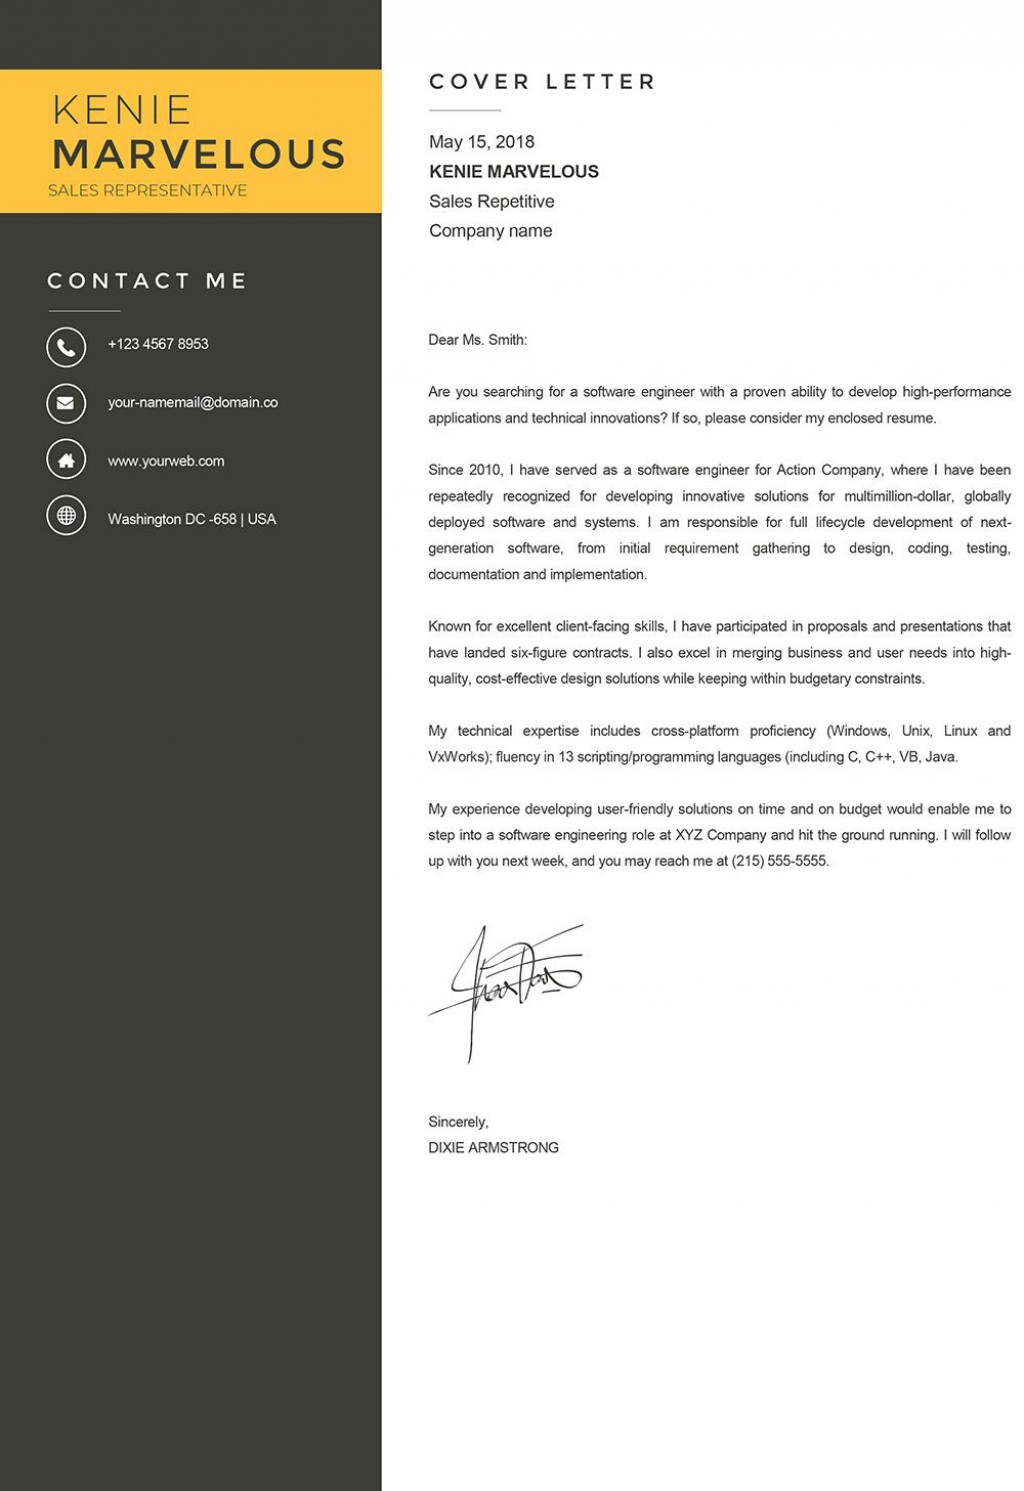 008 Best Cover Letter Sample Template Word Idea  Resume MicrosoftLarge